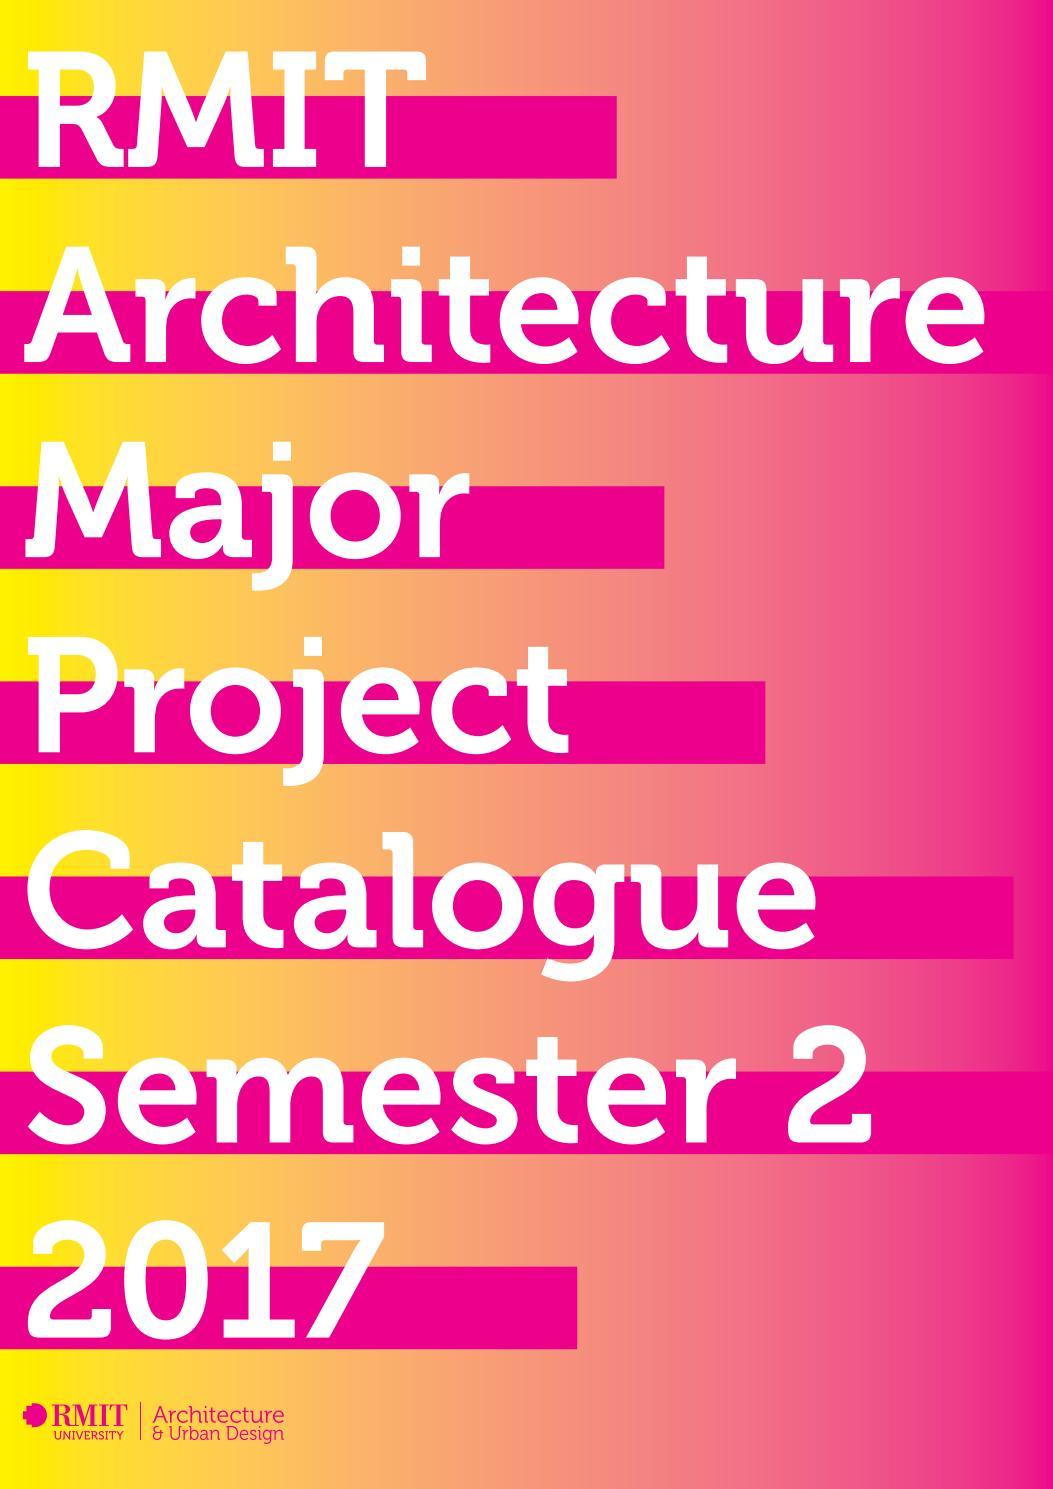 d3d321797d7 RMIT Architecture   Urban Design Major Project Catalogue Semester 2 2017